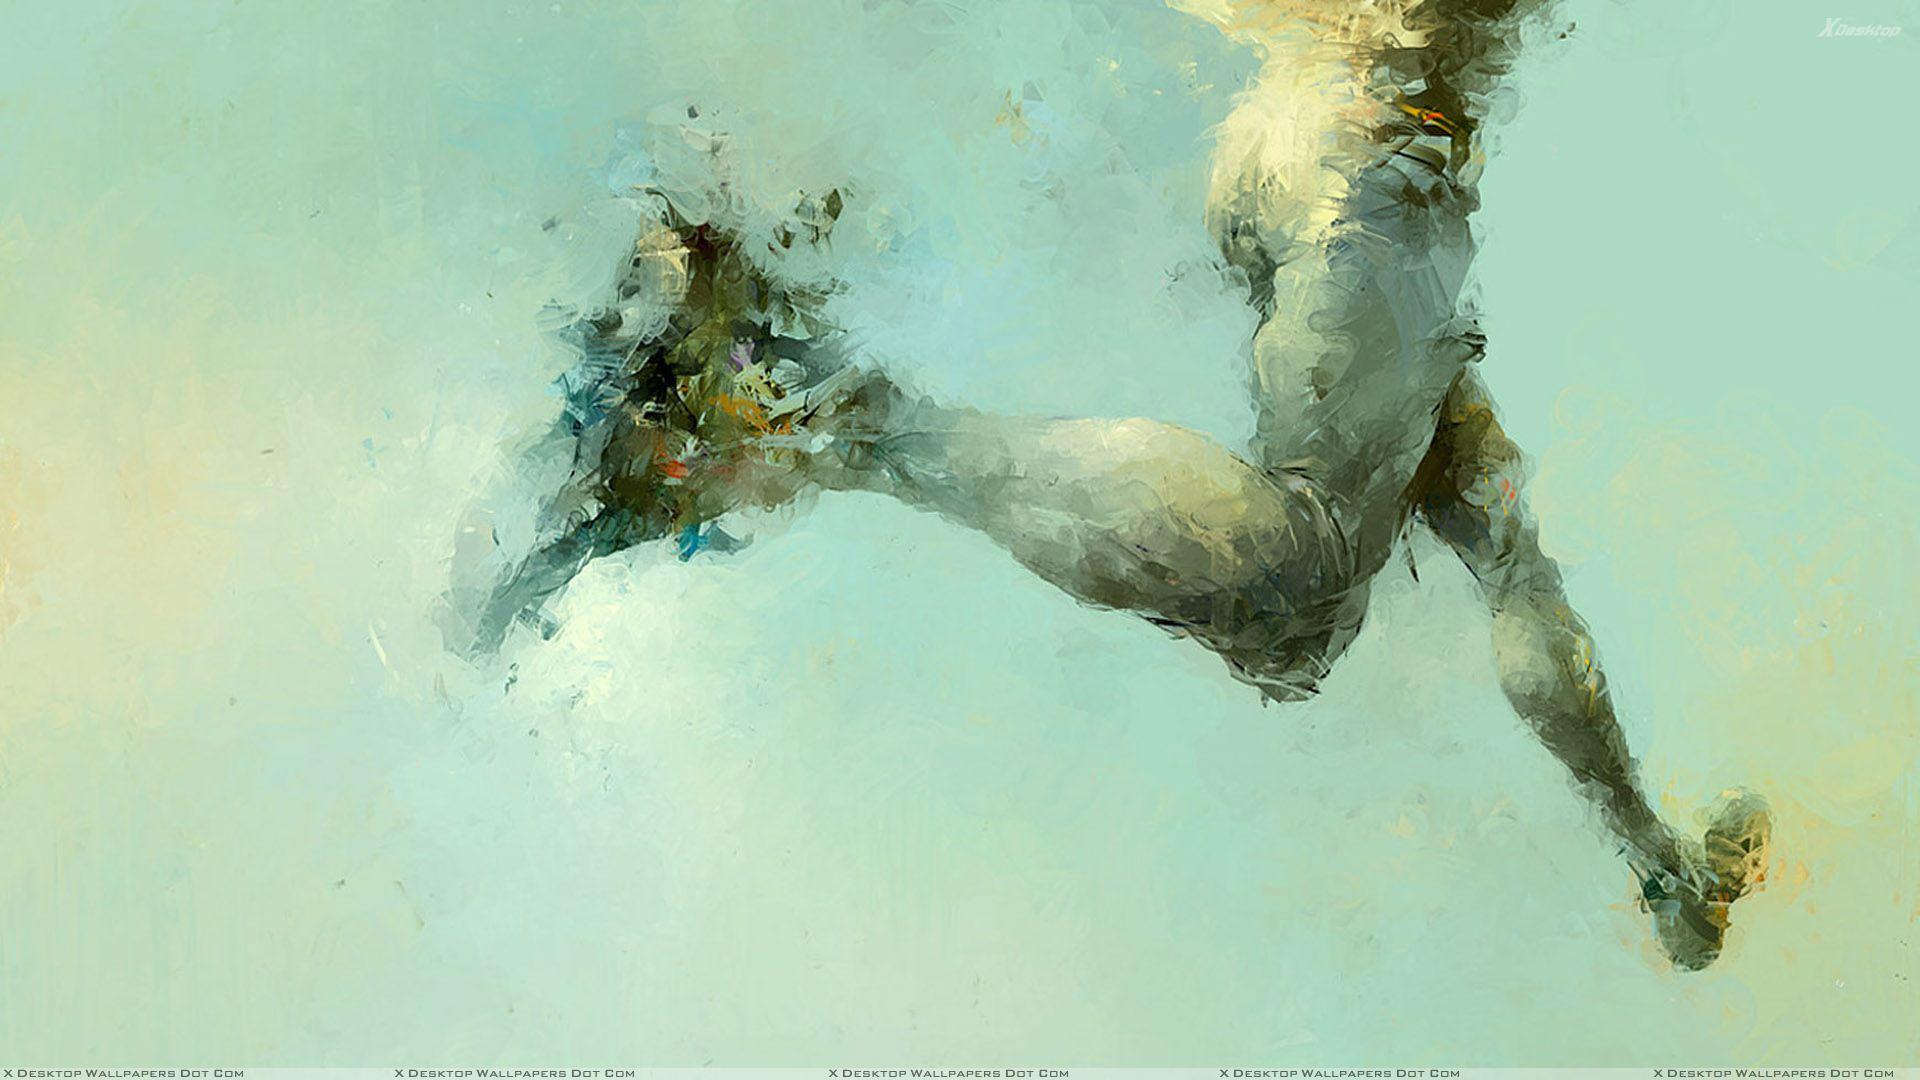 Running Man Wallpaper - WallpaperSafari